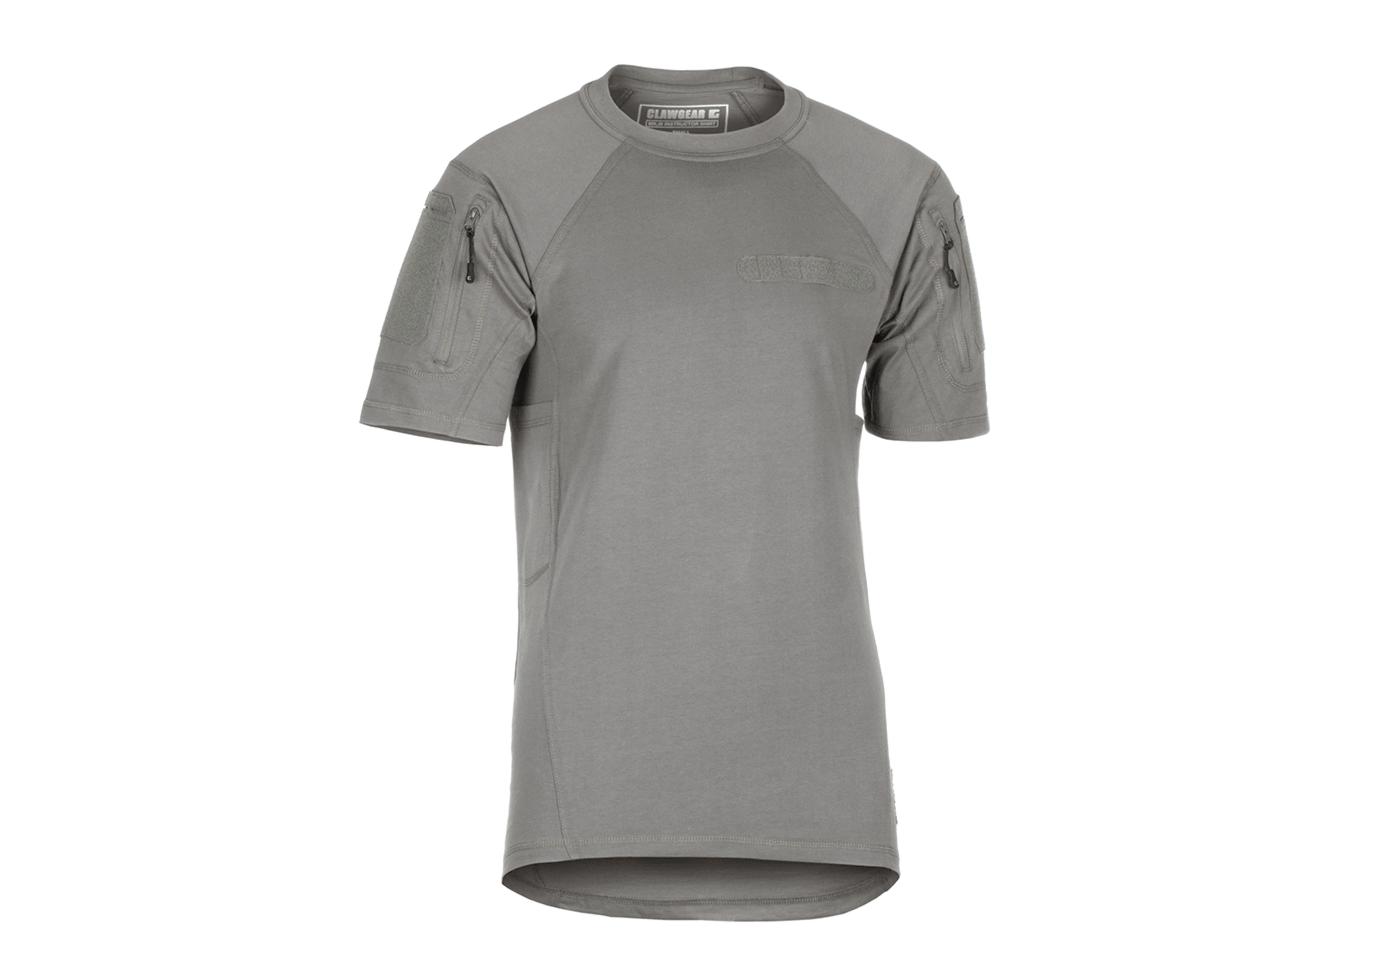 Mk.II Instructor Shirt Solid Rock 2XL - Tactical Shirts - Garments ... db16aeaea8f26